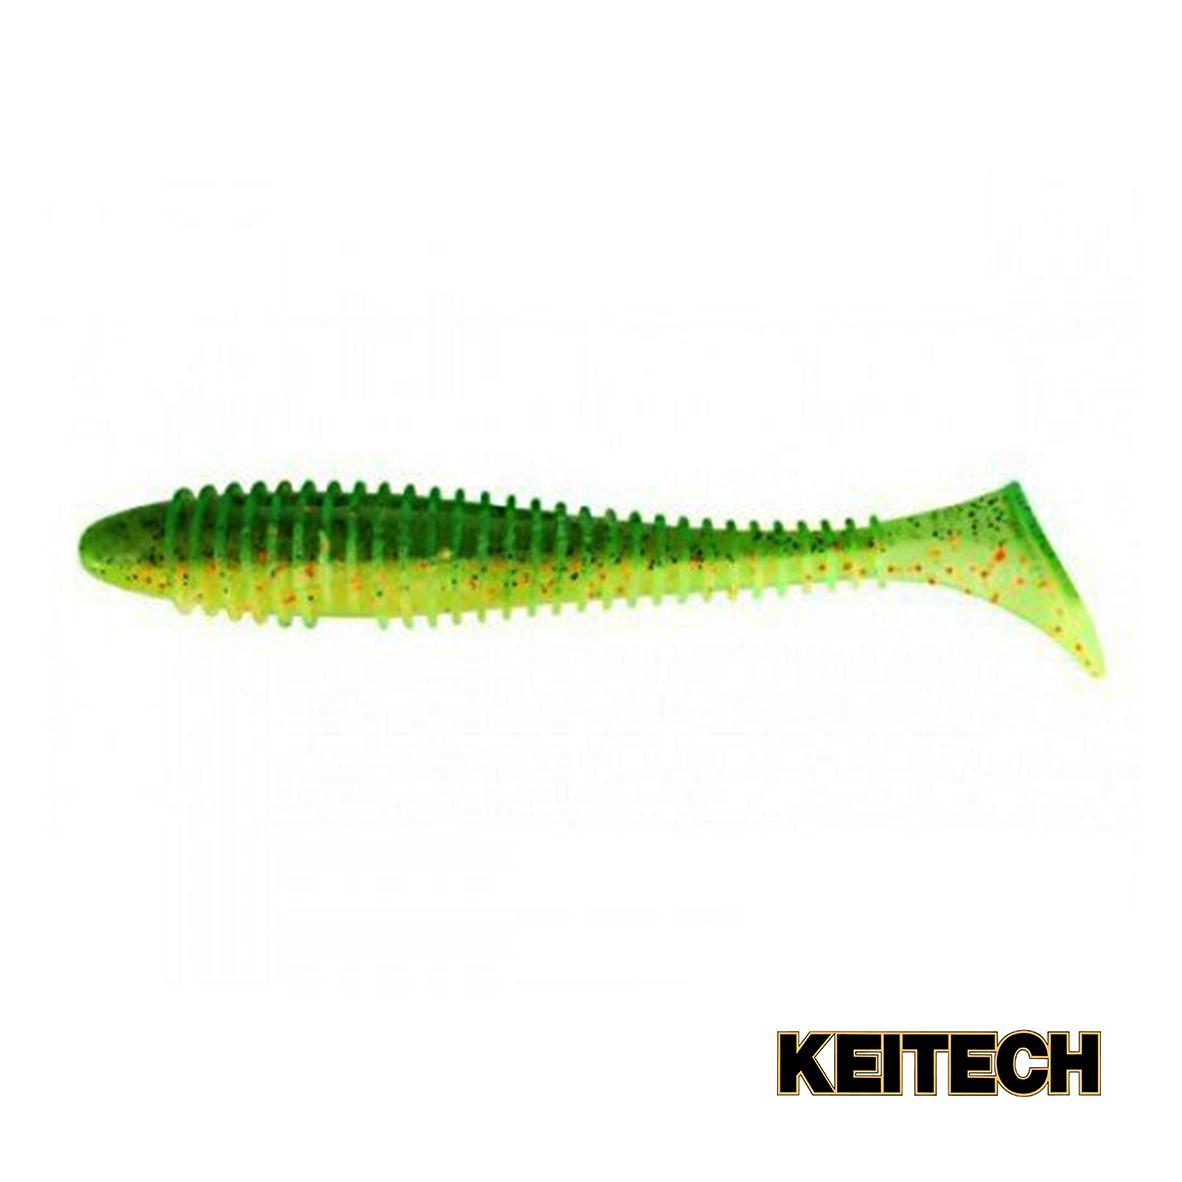 "Силикон Keitech Swing Impact FAT 3.3"" (7 шт/упак) ц:ea#05 hot fir"